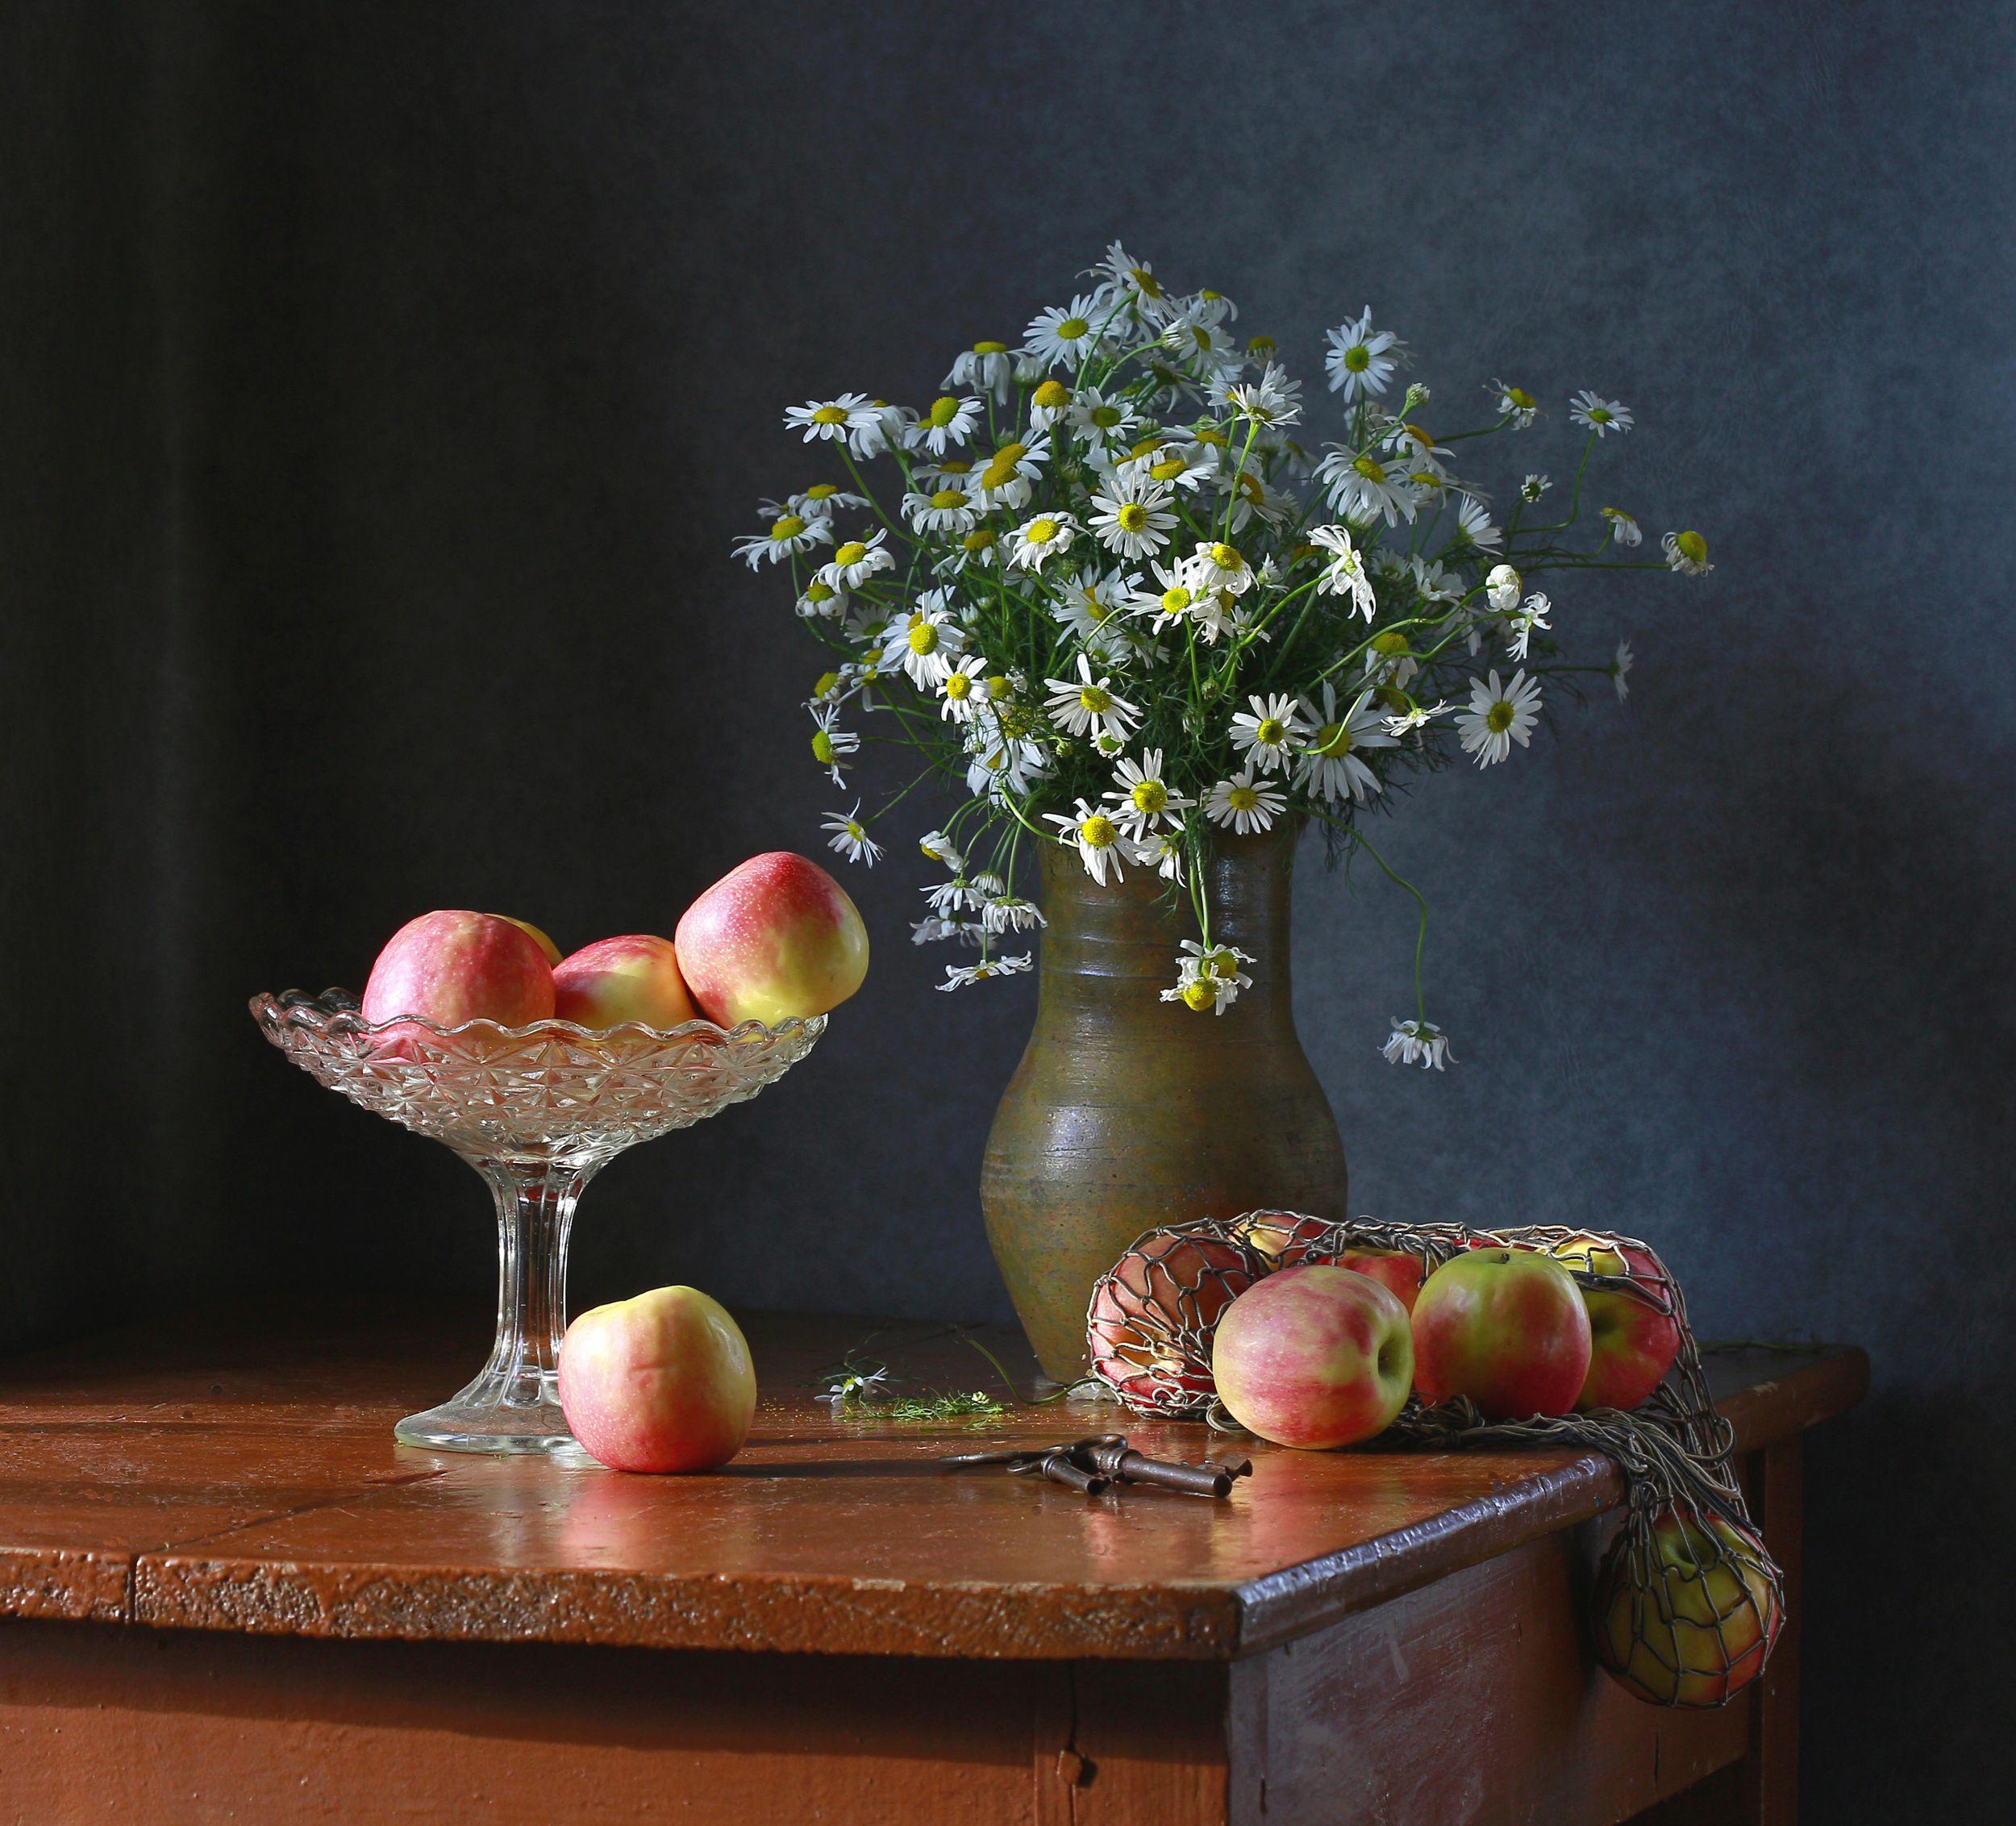 натюрморт, фотонатюрморт, лето, осень, яблоки, ромашки, наталья казанцева, Казанцева Наталья